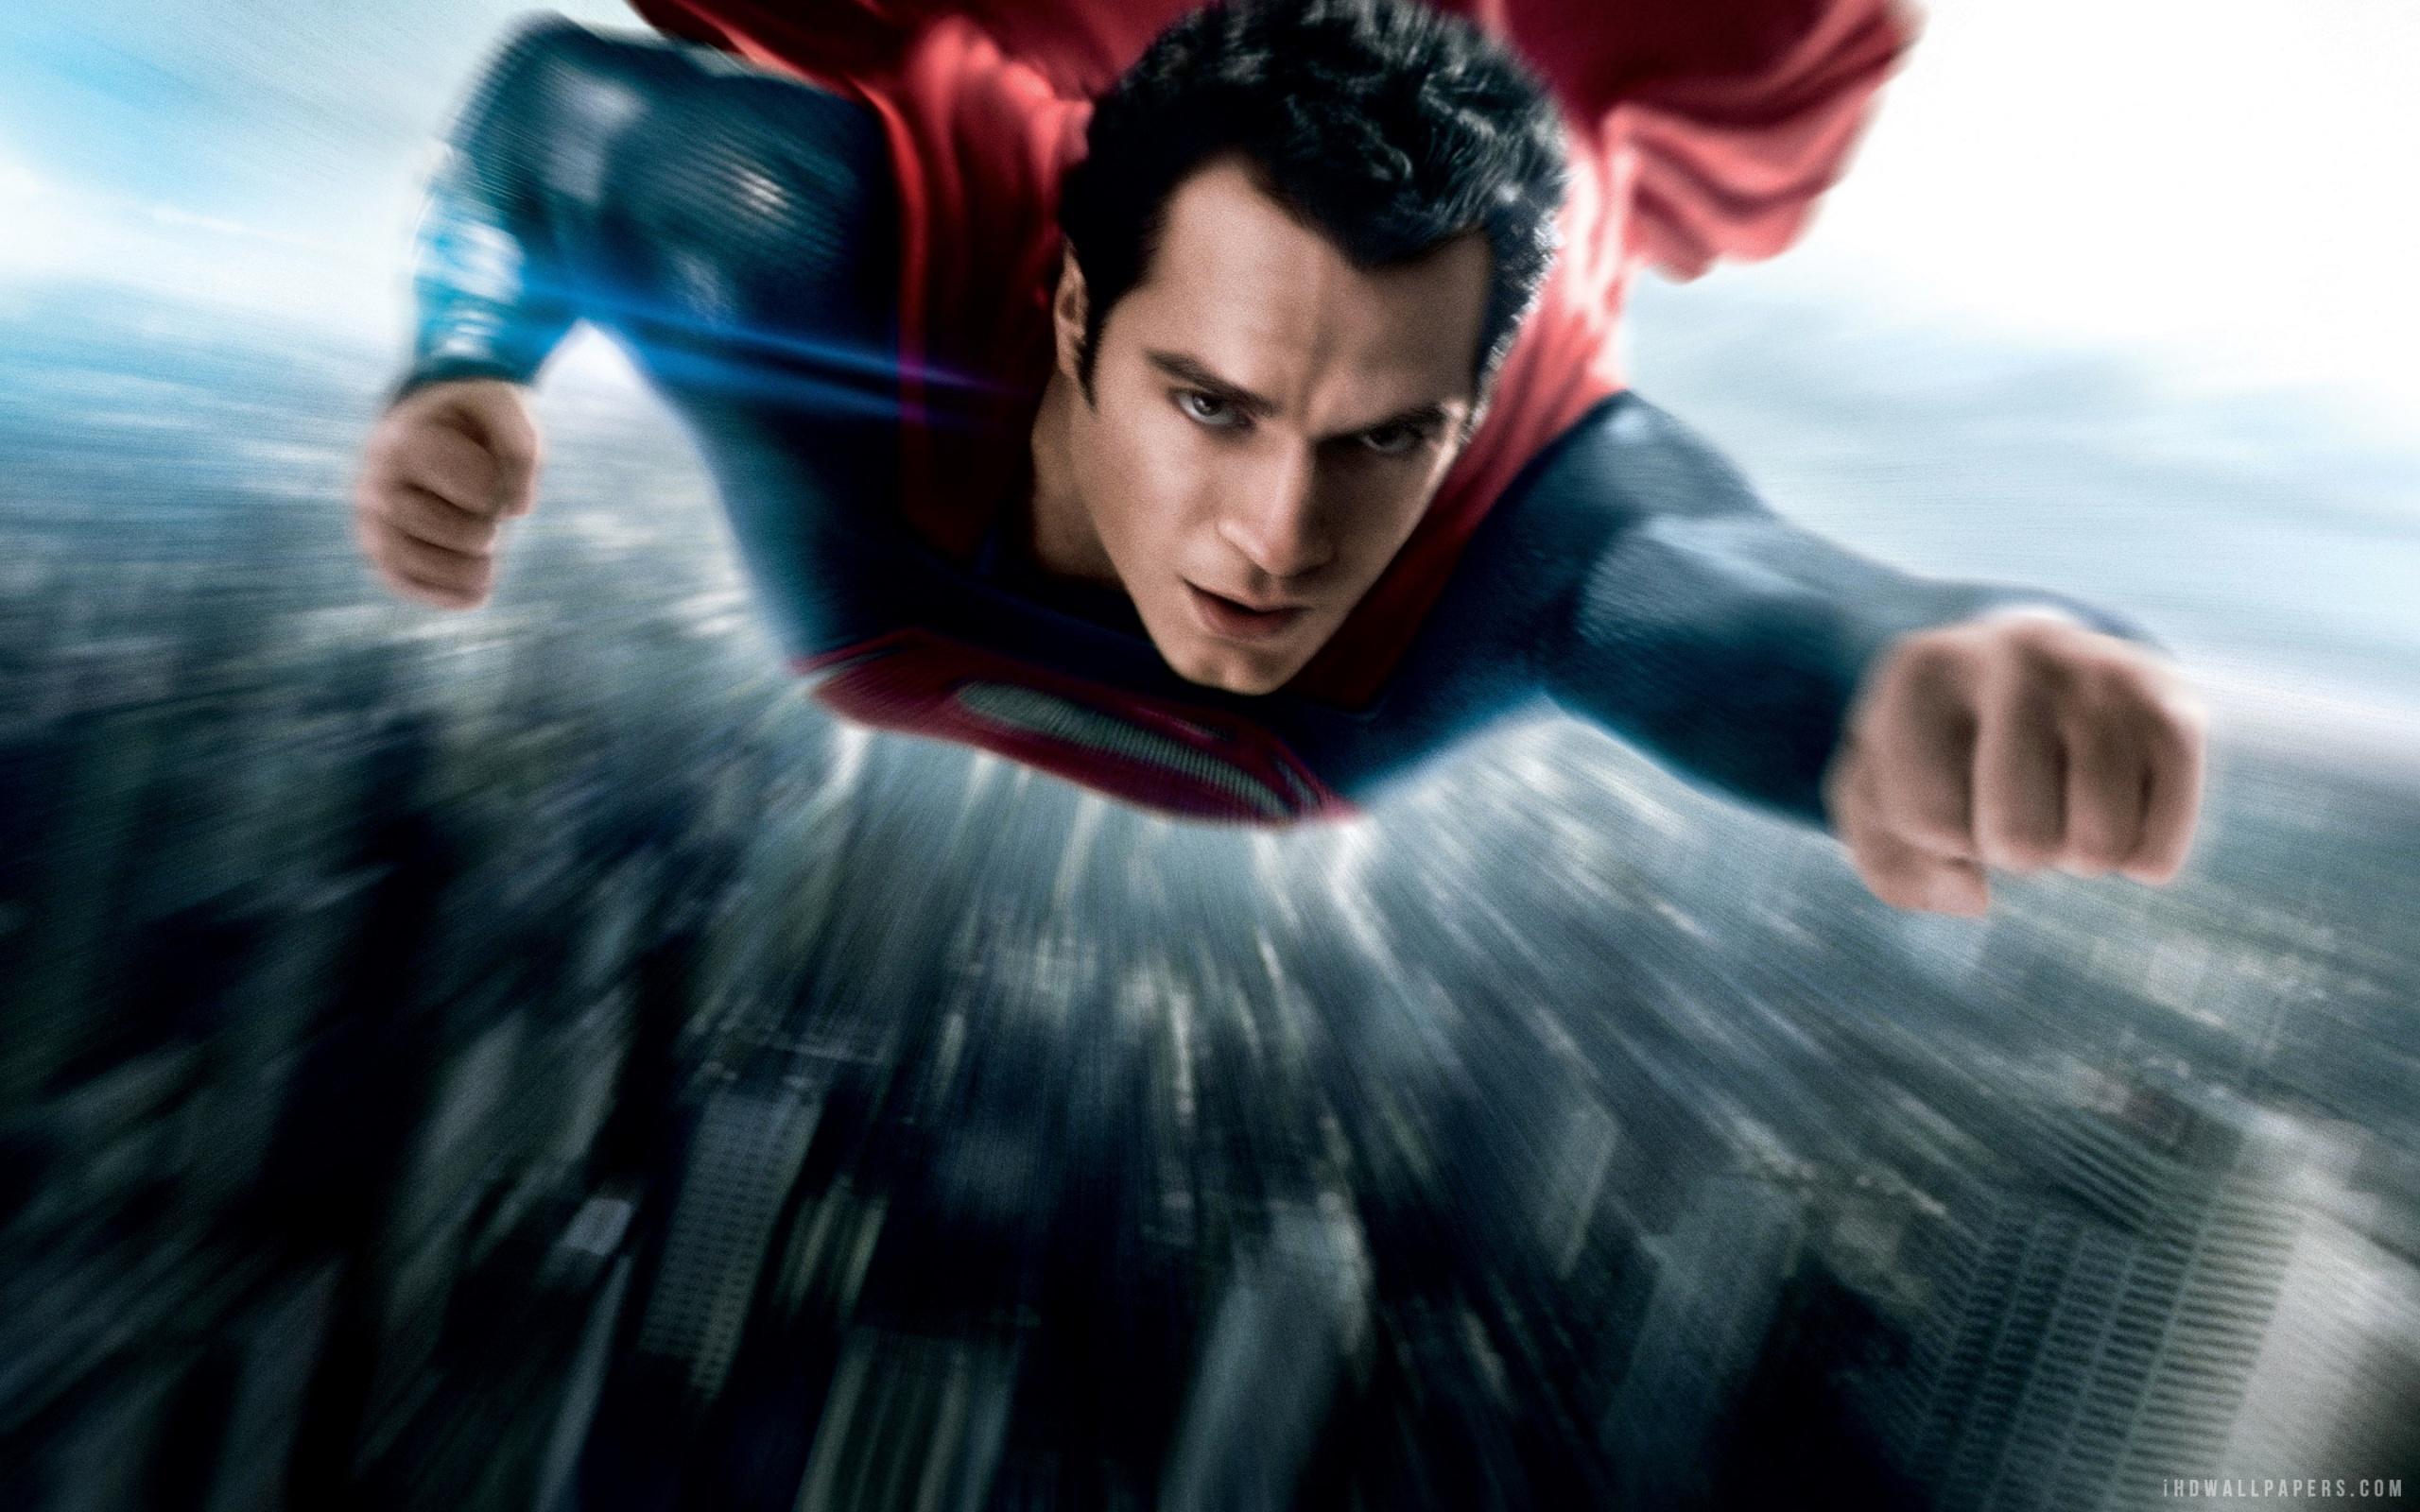 man_of_steel_superman_movie-2560x1600